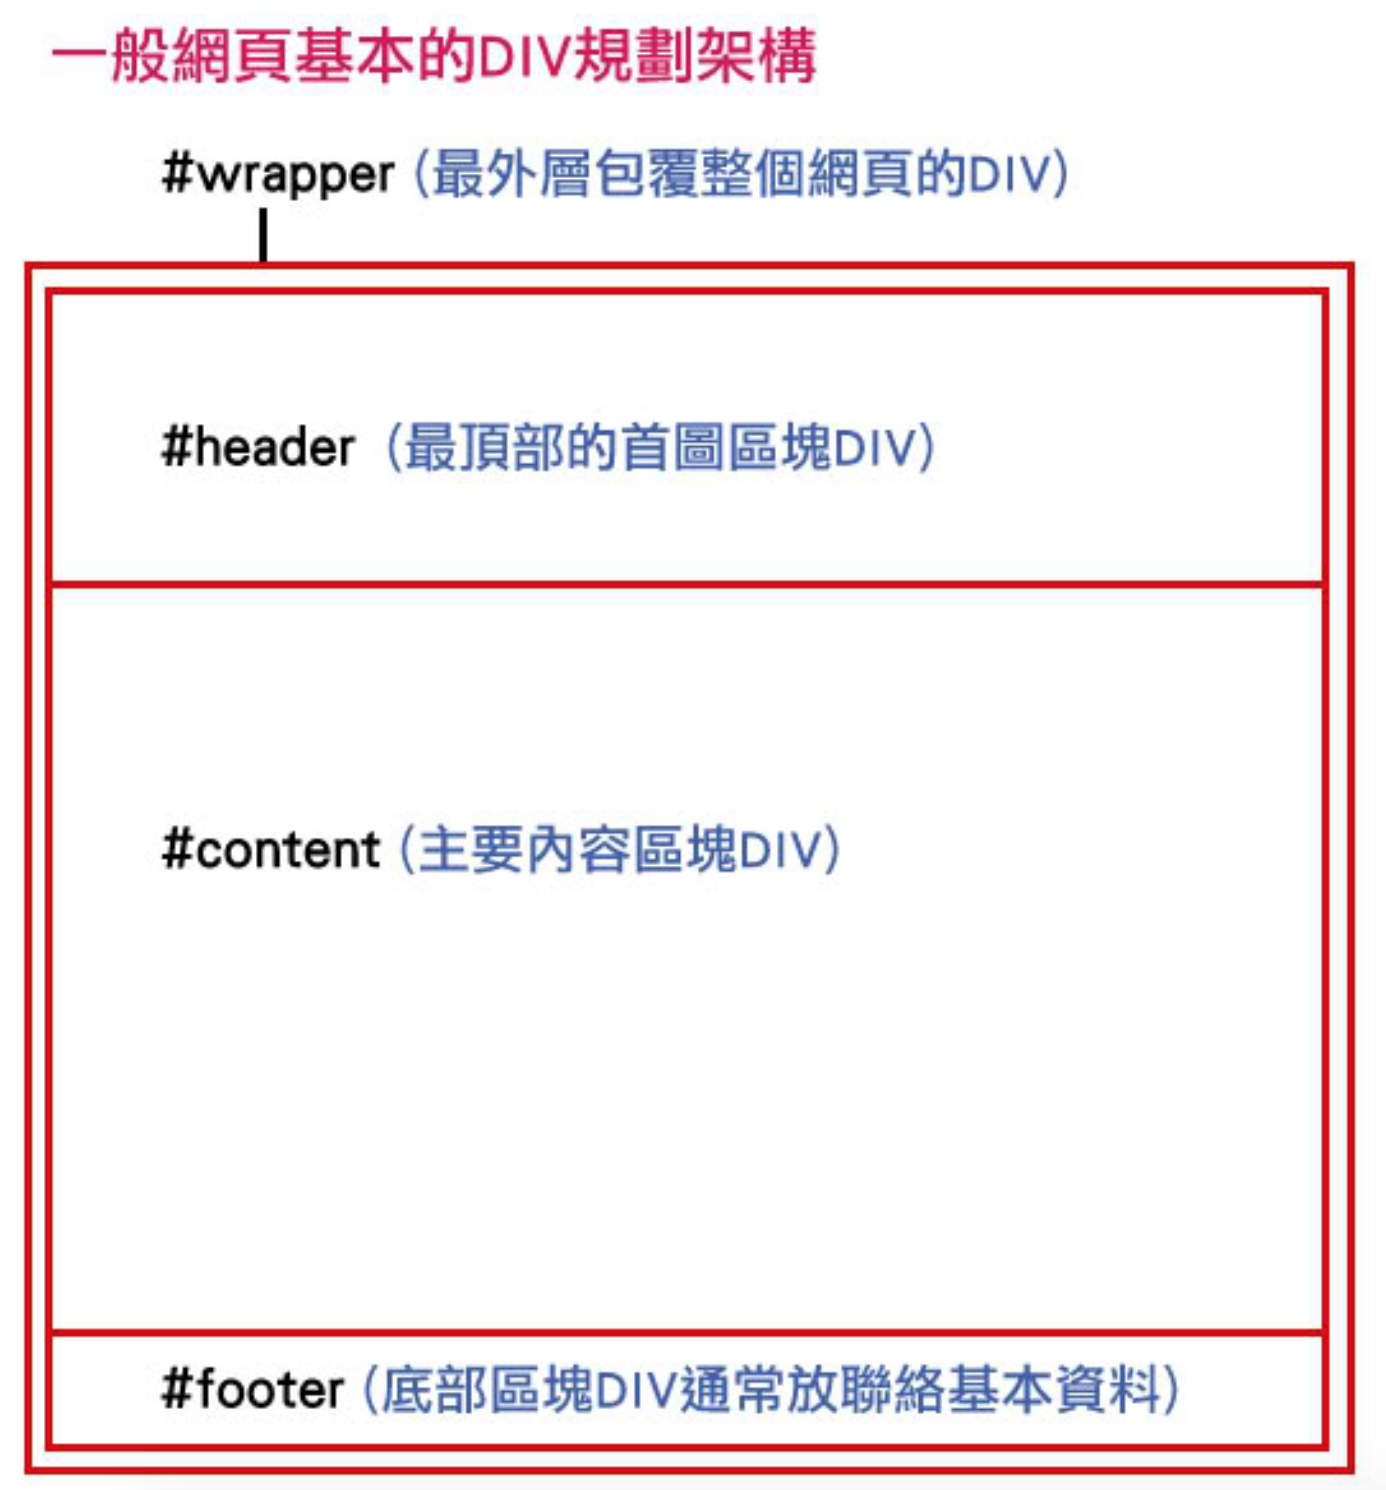 http://mepopedia.com/~jinjin/web/img/2-01.png